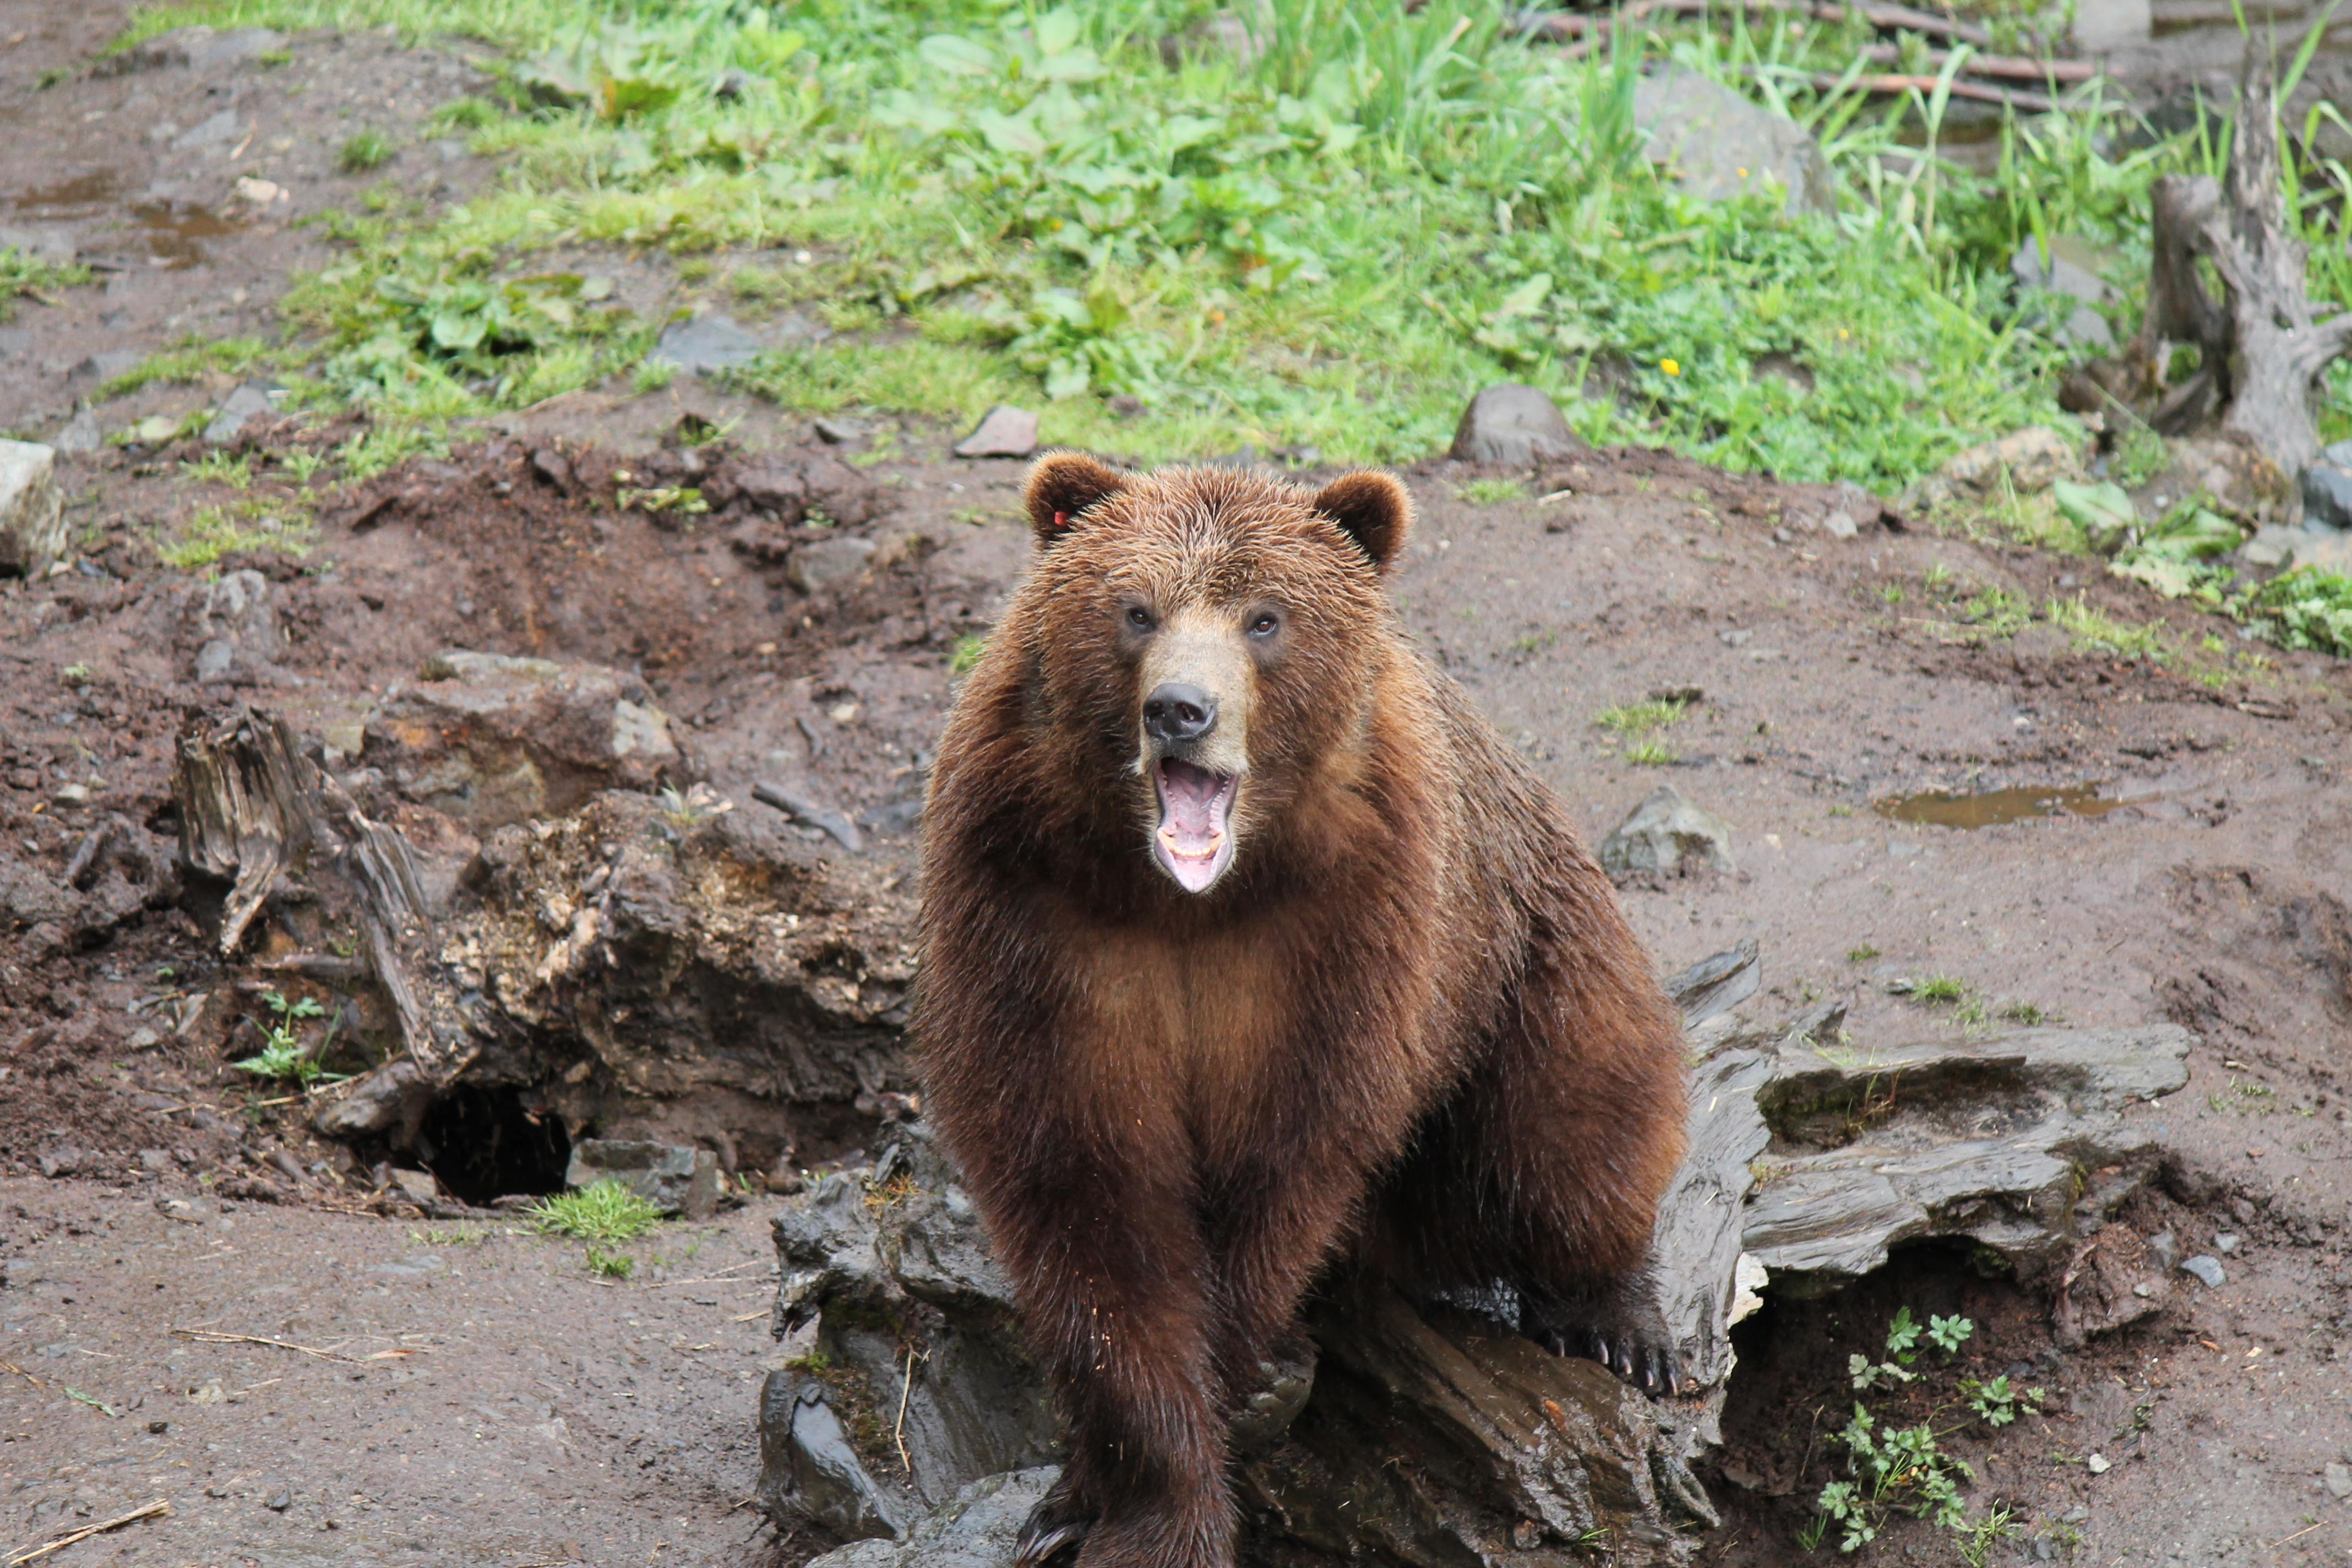 Alaskan animals–Add your own caption | Beth Warstadt